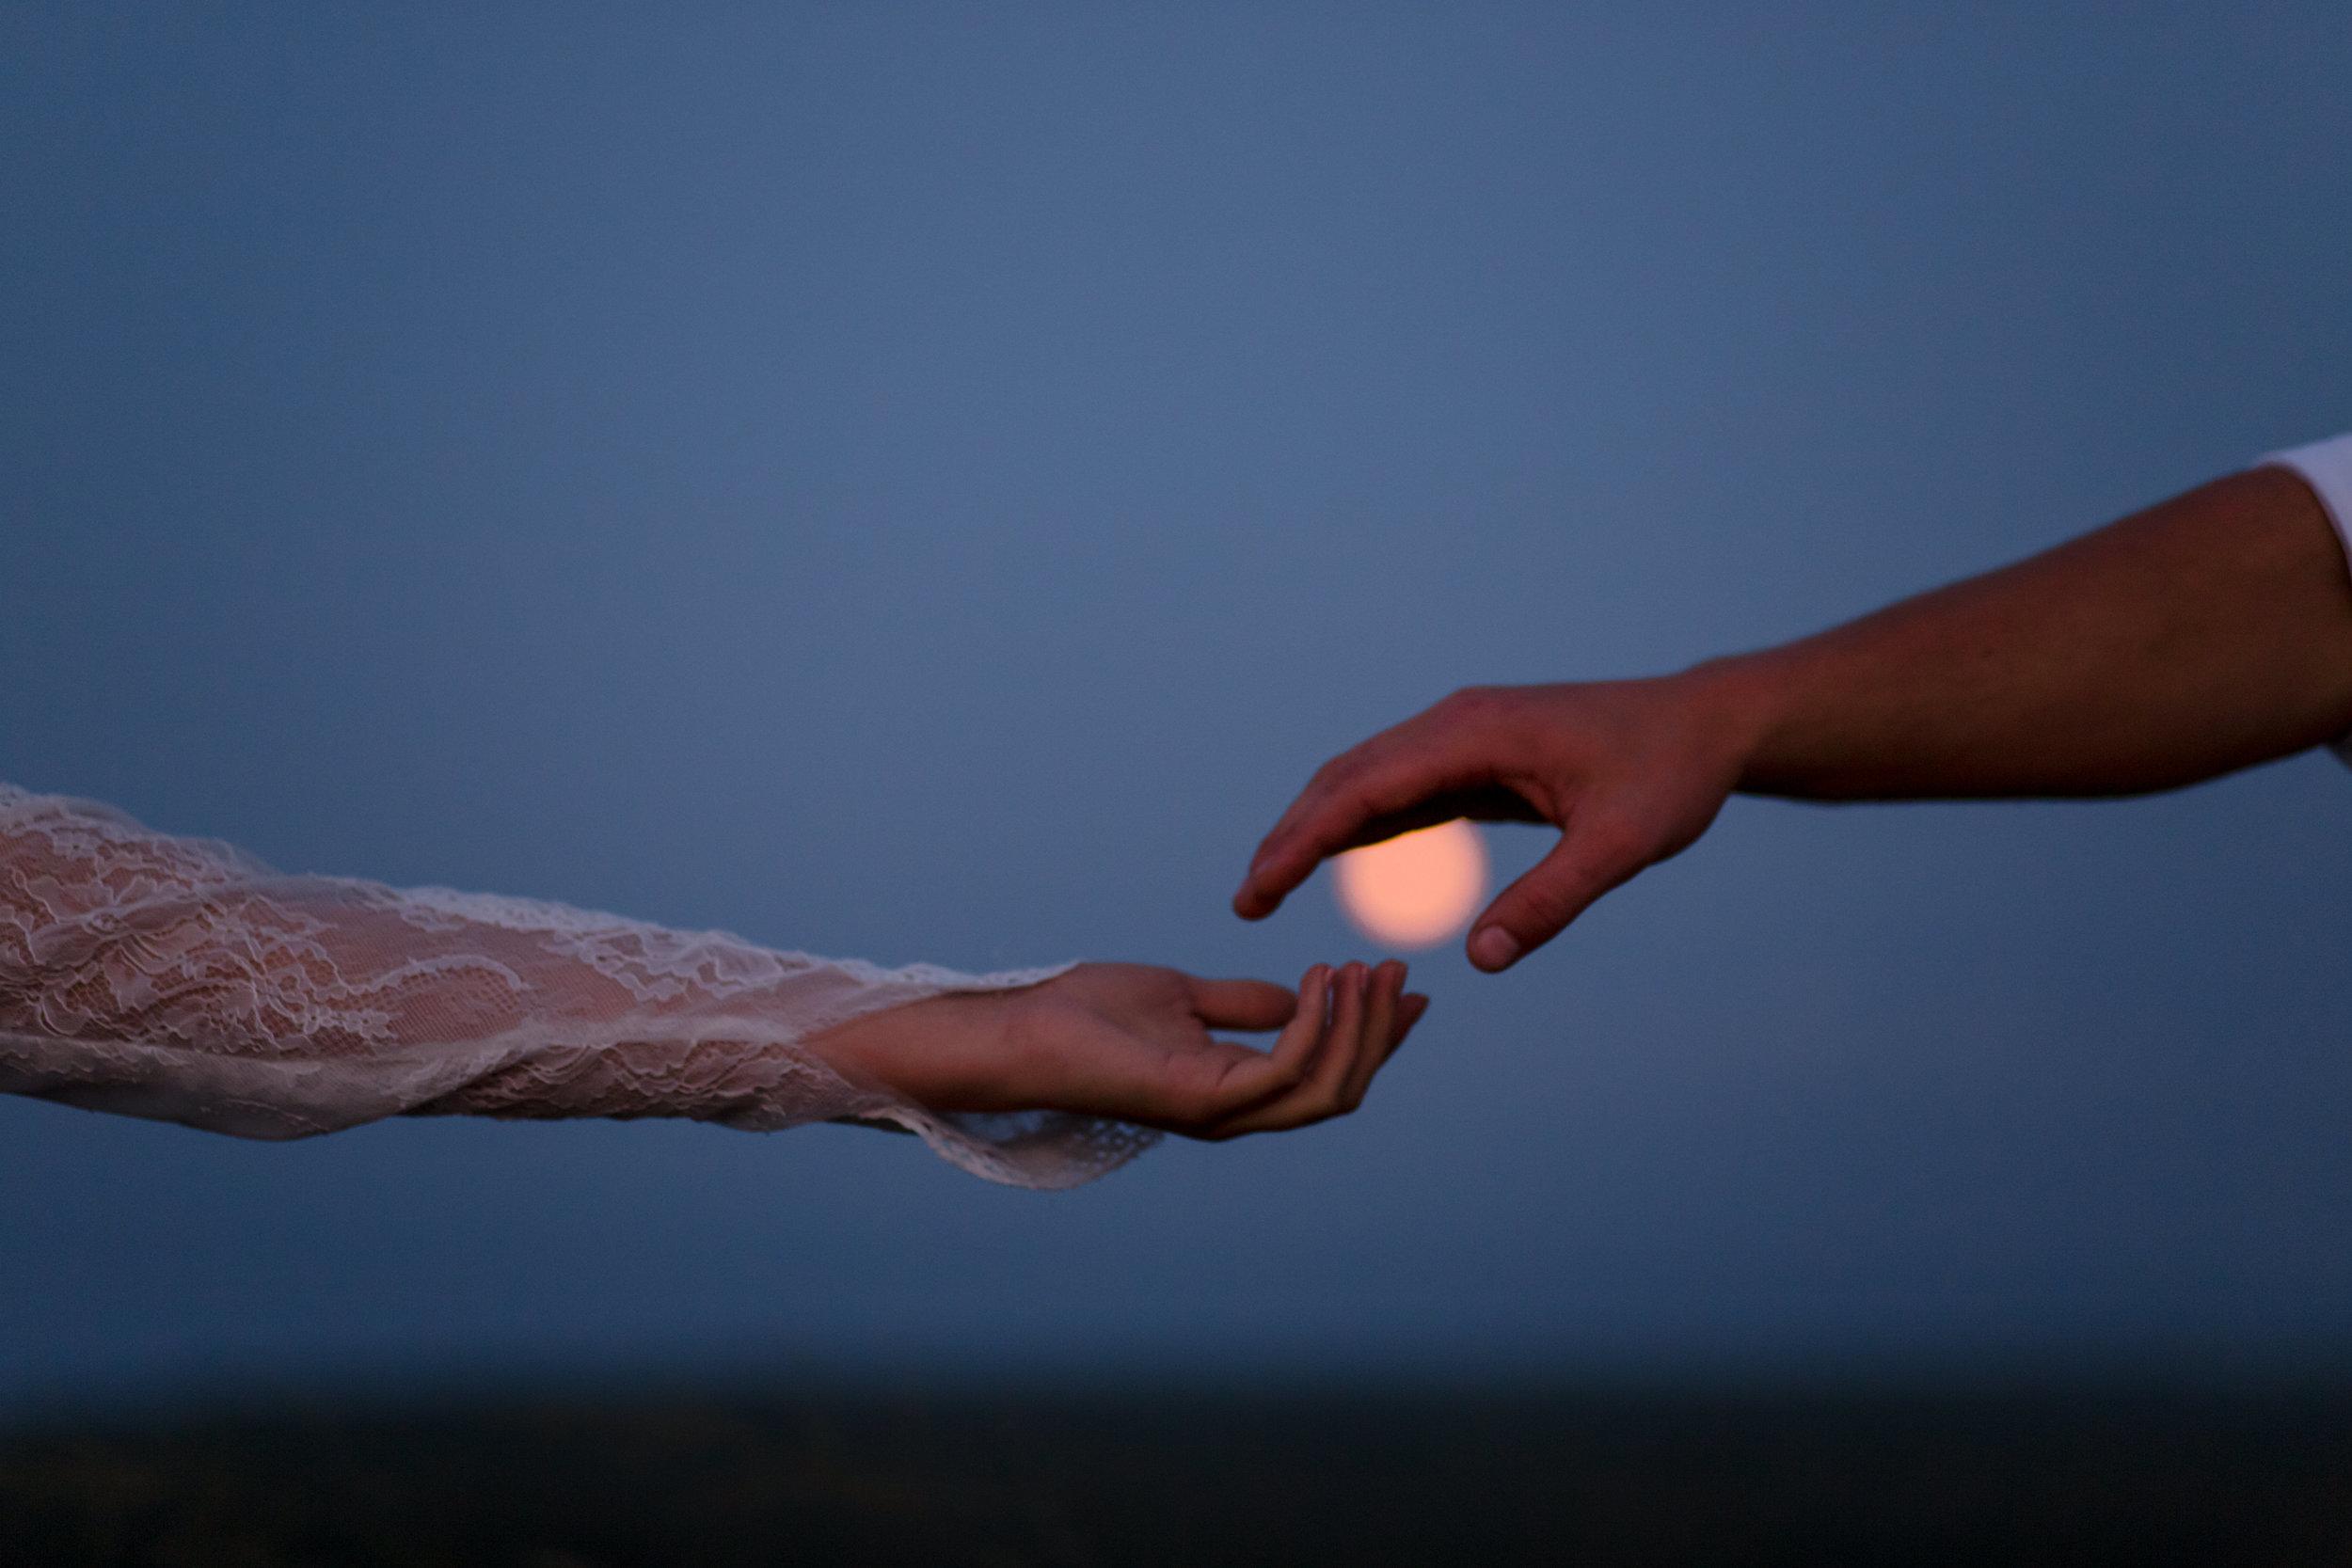 michigan-emotive-photographer-moonlight-elopement-mariha-hunter-347.jpg